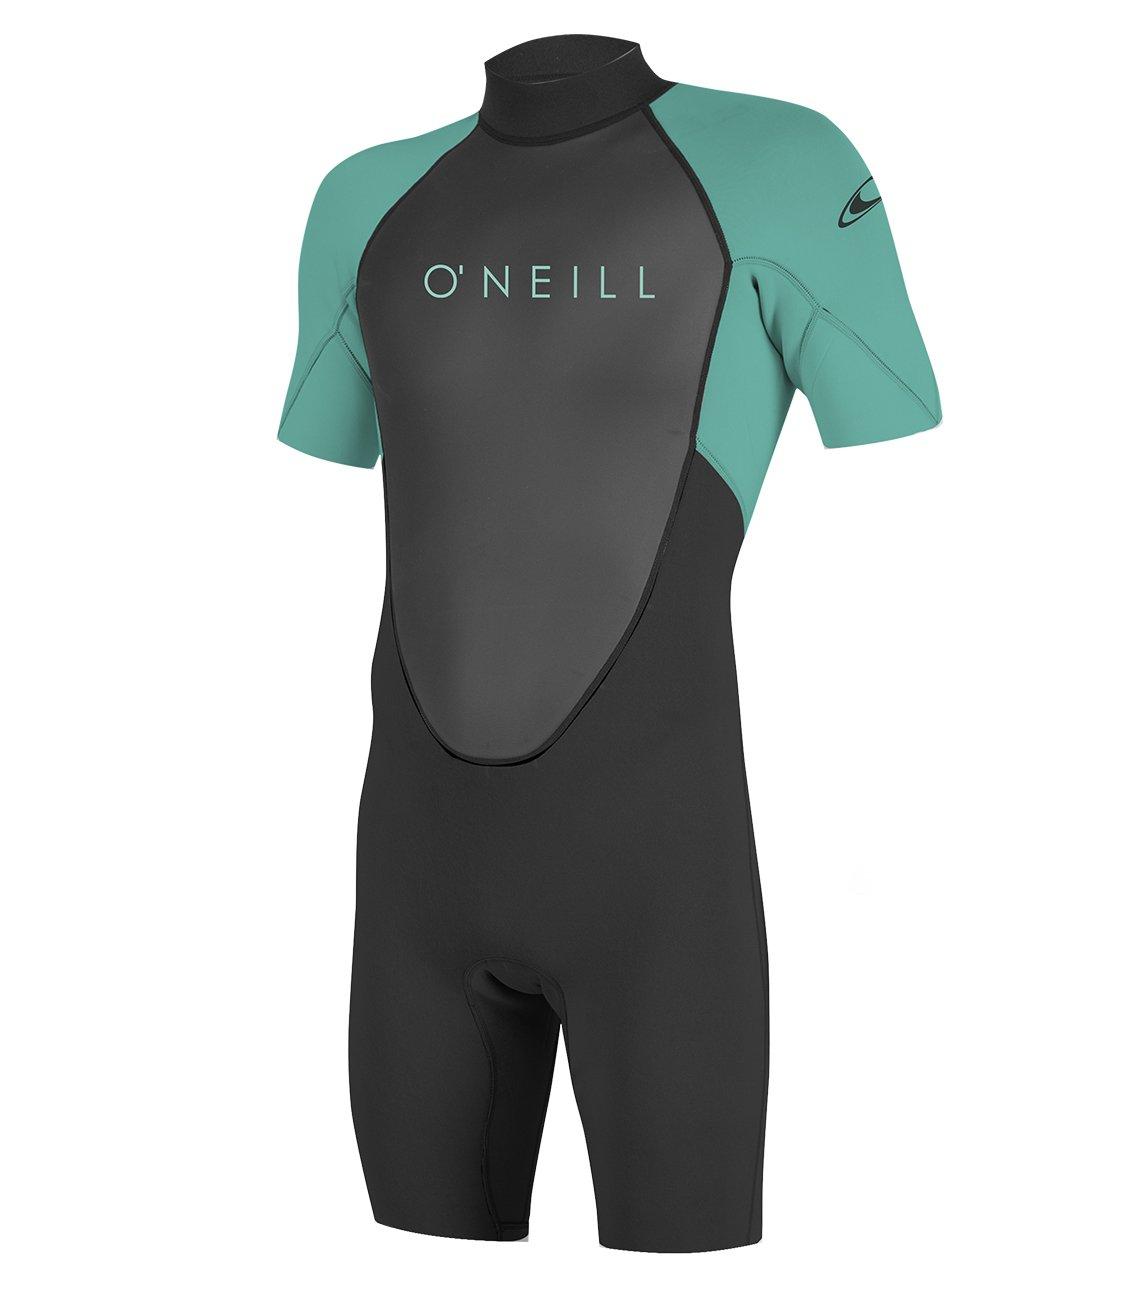 O'Neill Youth Reactor-2 2mm Back Zip Short Sleeve Spring Wetsuit, Black/Aqua, 4